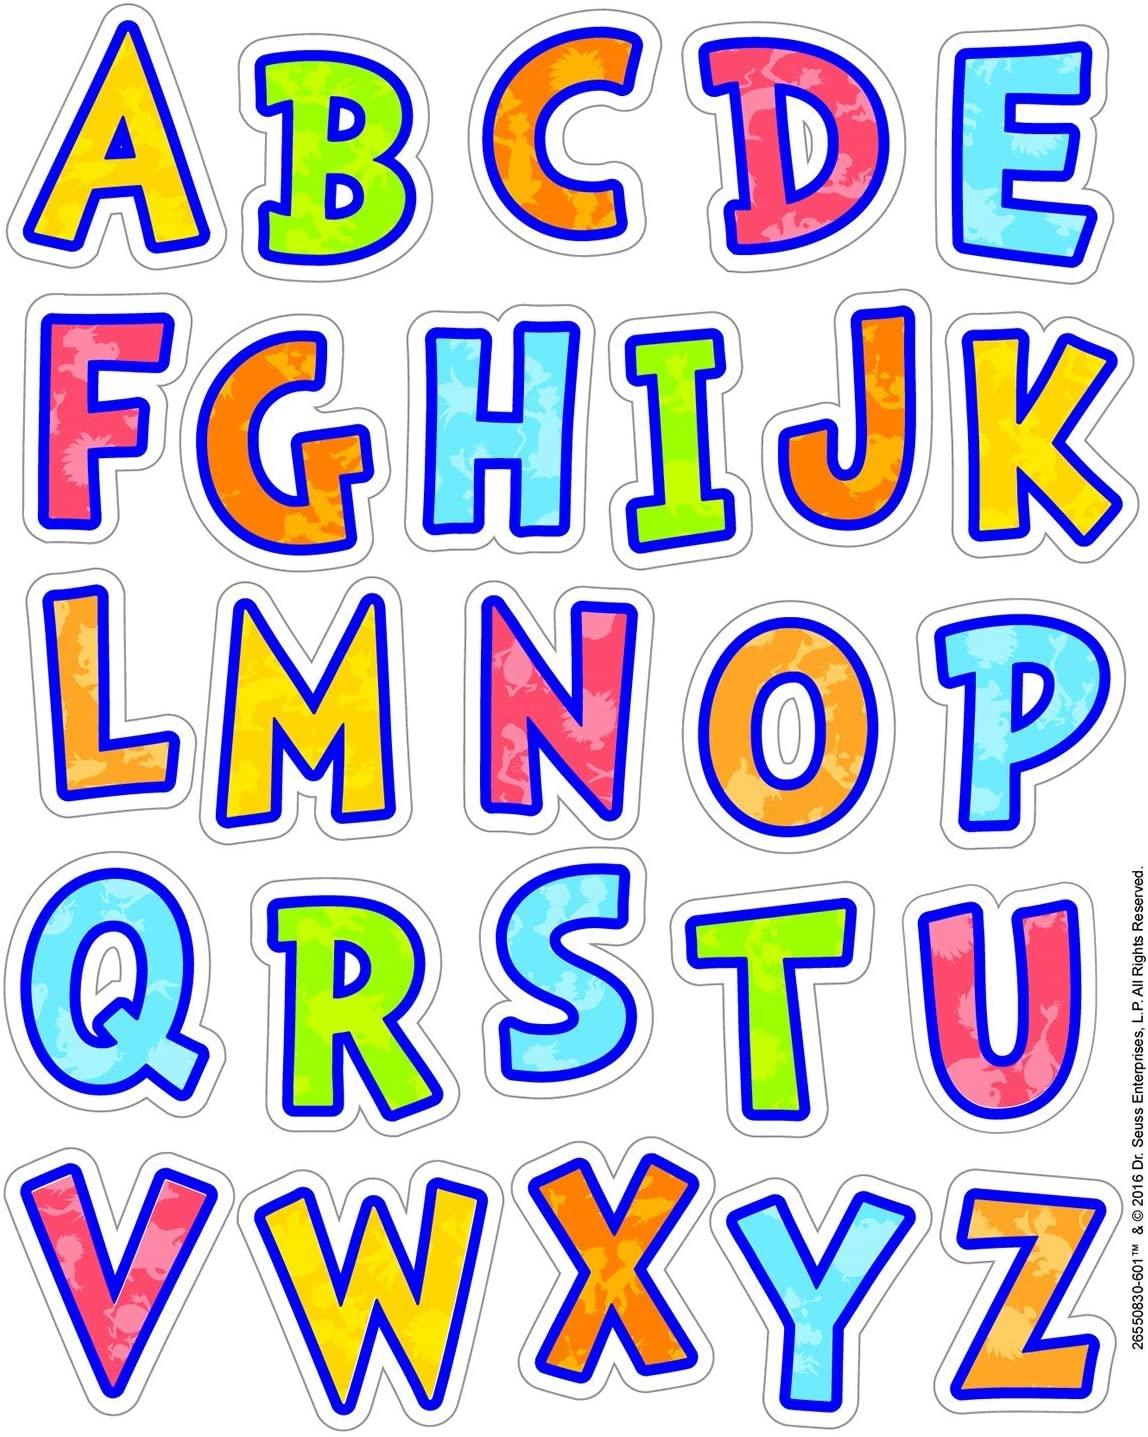 Eureka Back to School Multicolored Dr. Seuss Alphabet Stickers for Kids, 130pc, 1.31'' x 1.75''